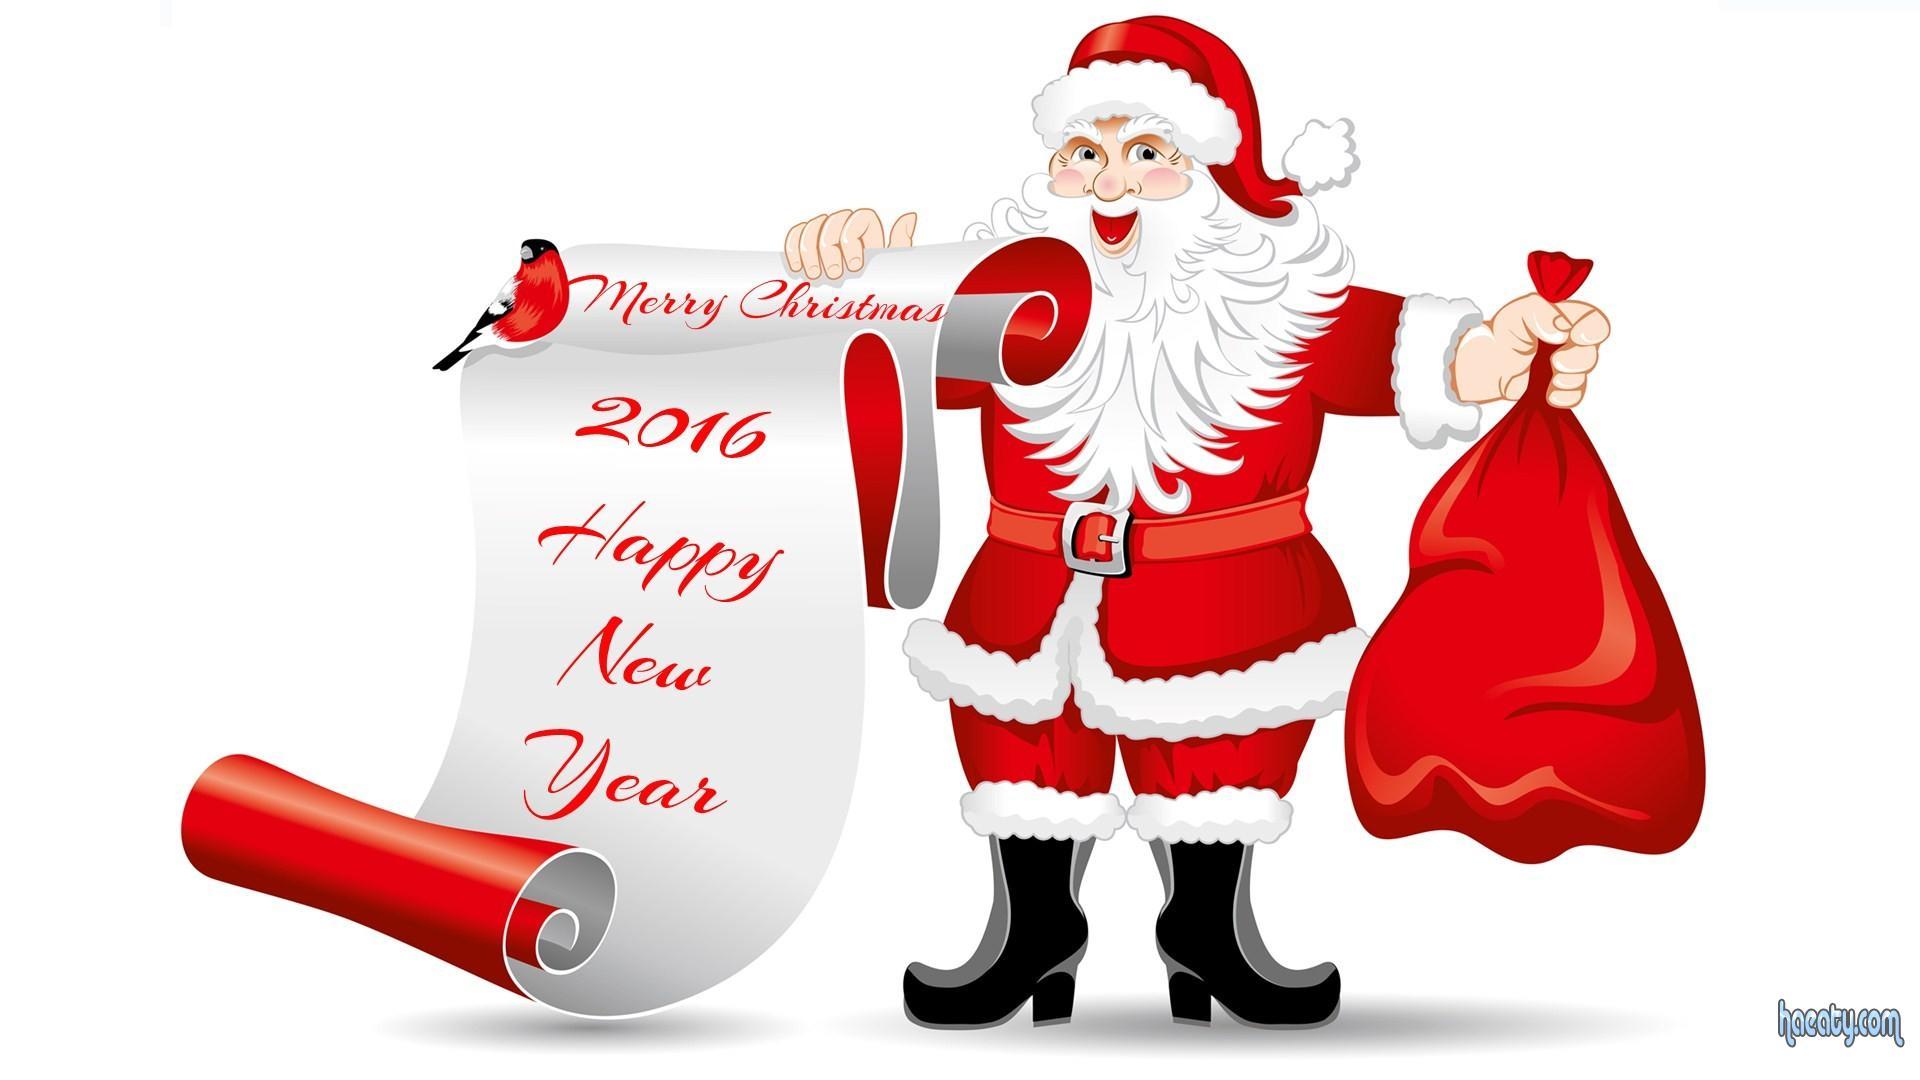 الكريسماس 2016-Merry-Christmas-and-Happy-new-year-2016 1450540620141.jpg